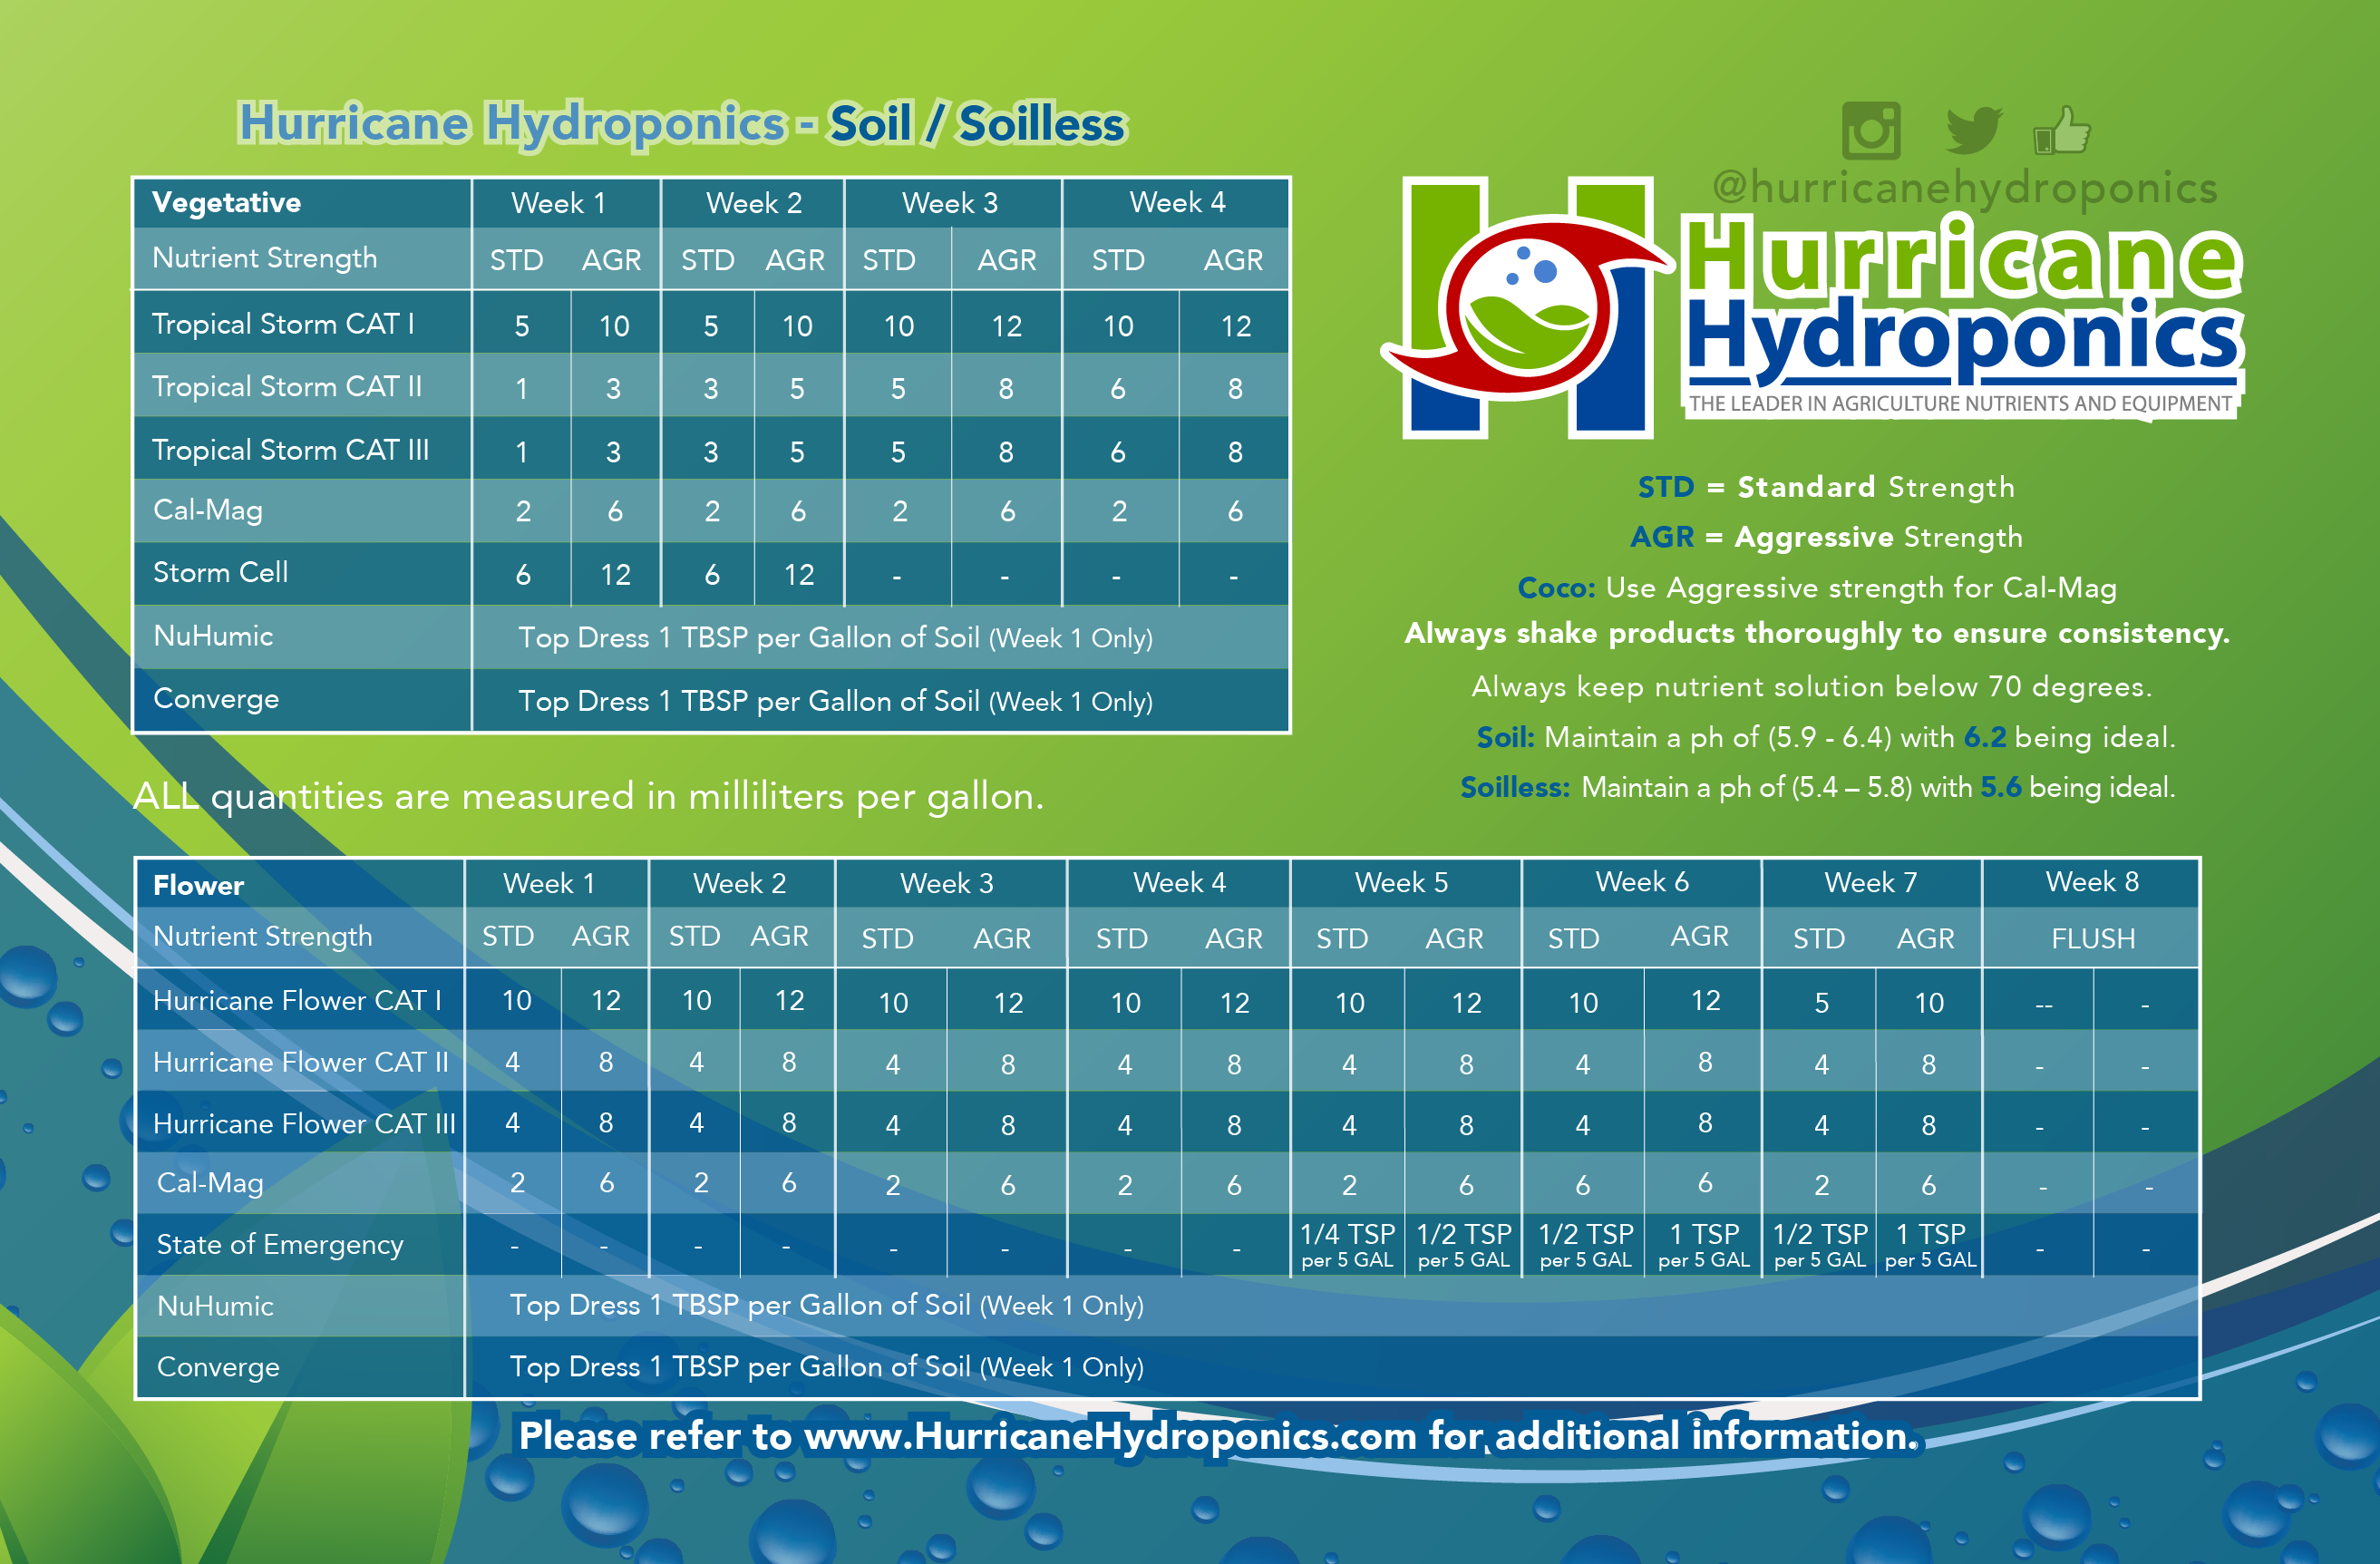 Hurricane Hydroponics Soil Soilless Chart